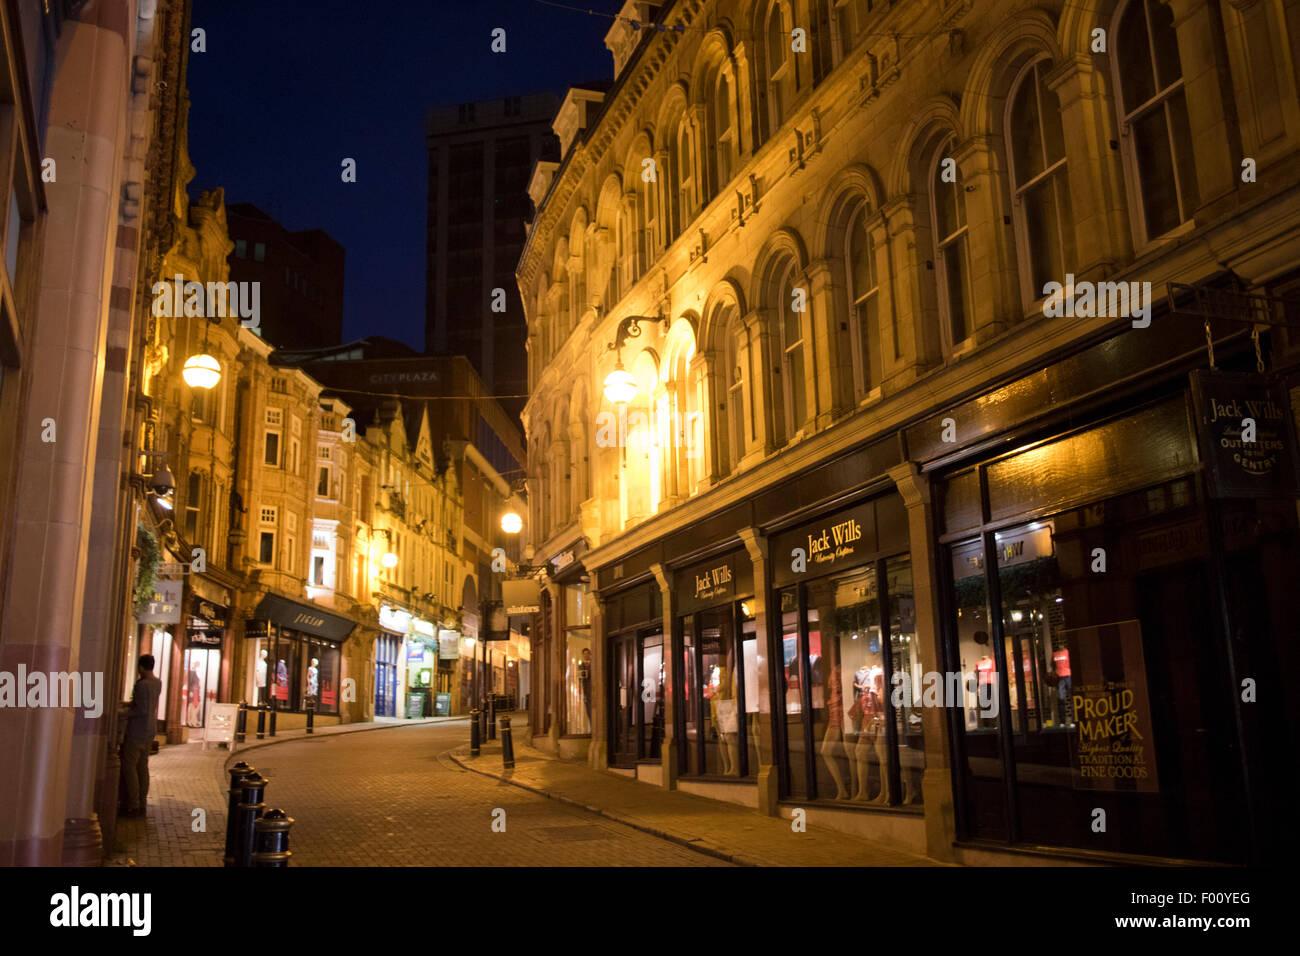 shops on cannon street birmingham city centre at night england uk - Stock Image